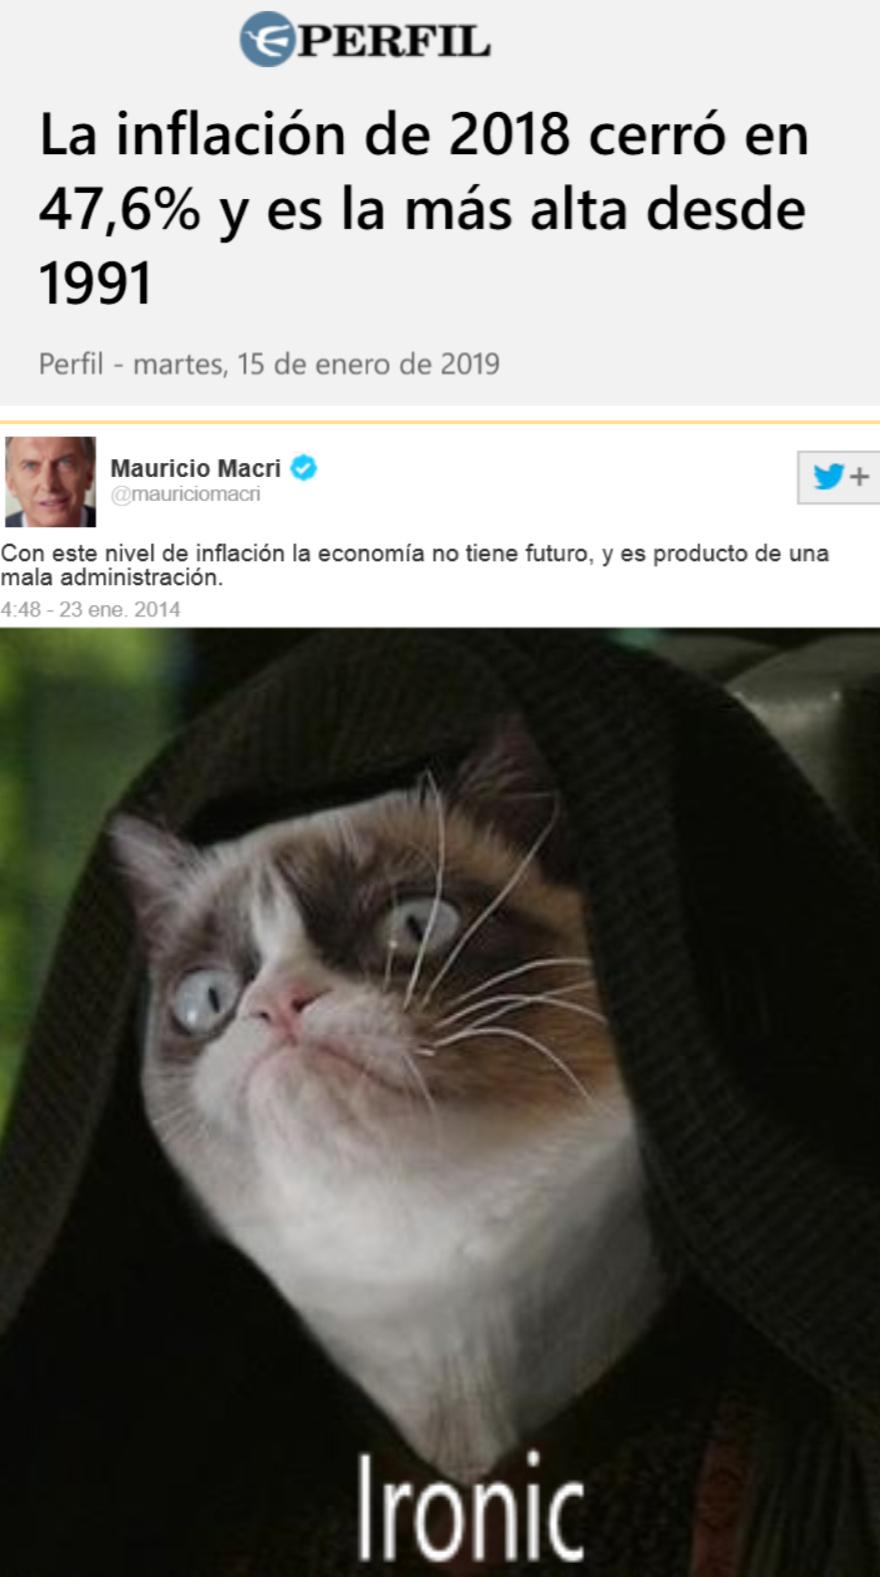 argentina un país con buena inflación - meme